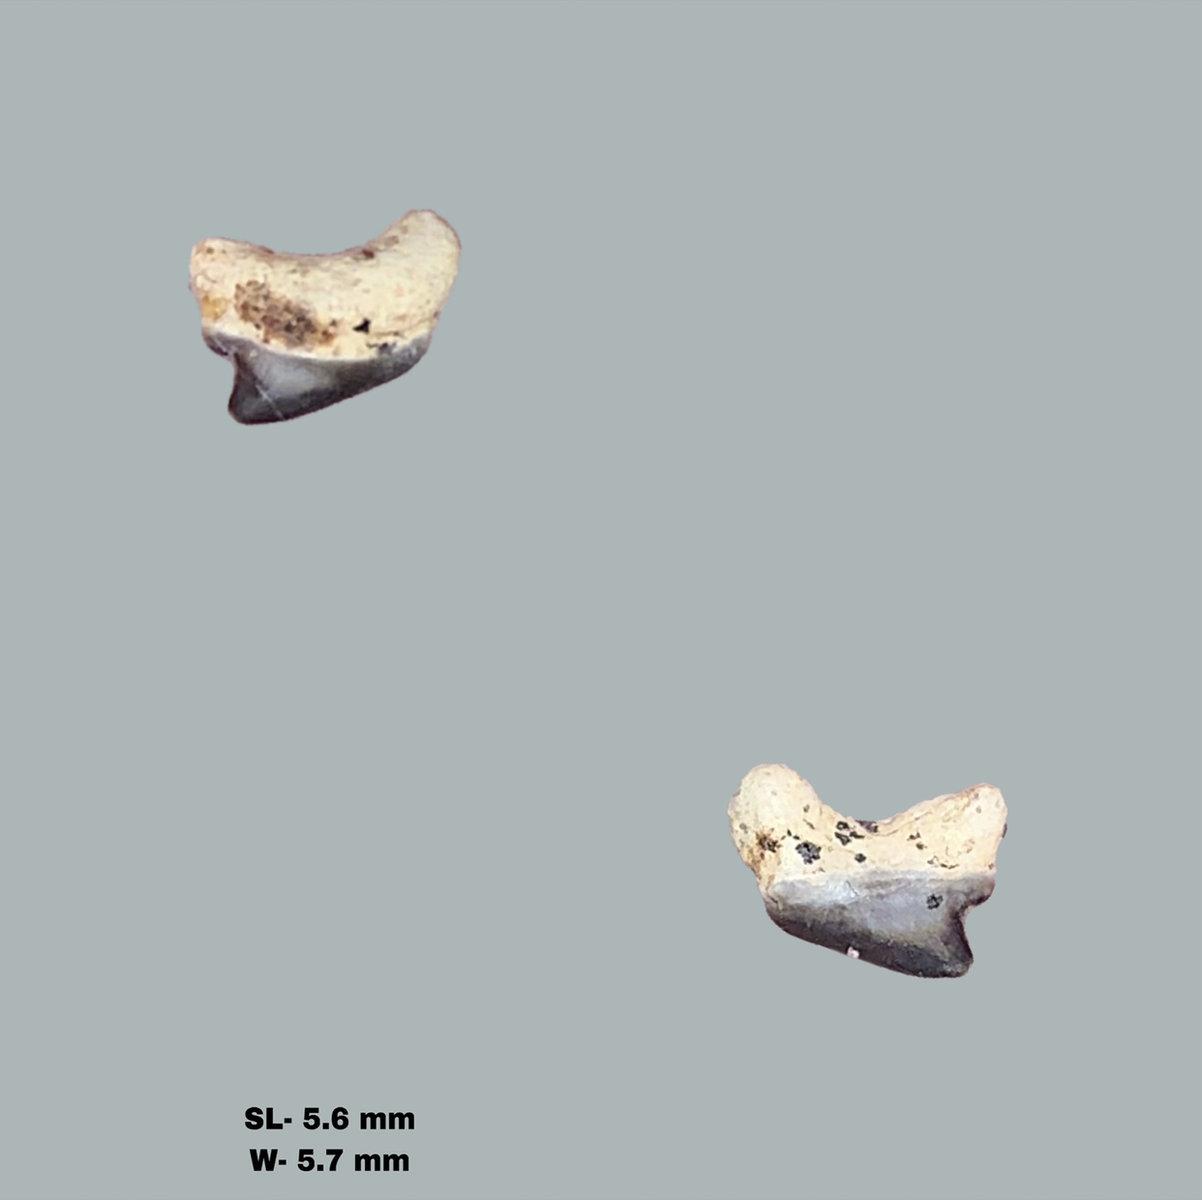 Cenomanian Shark Teeth and other Marine Fauna, Ryazan Oblast, Russia